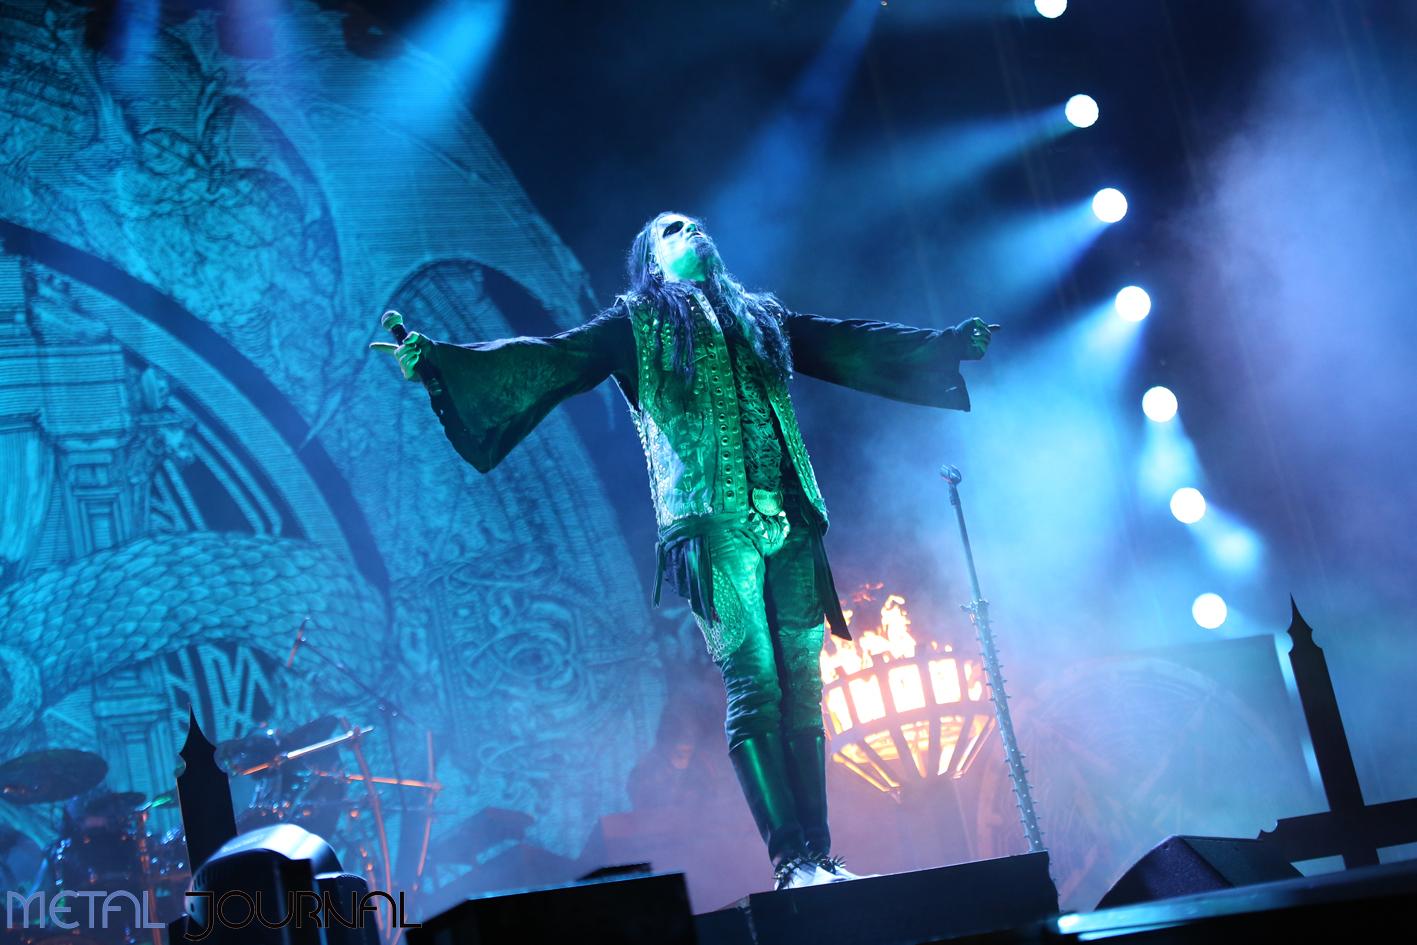 dimmu borgir rock fest 18 - metal journal pic 1